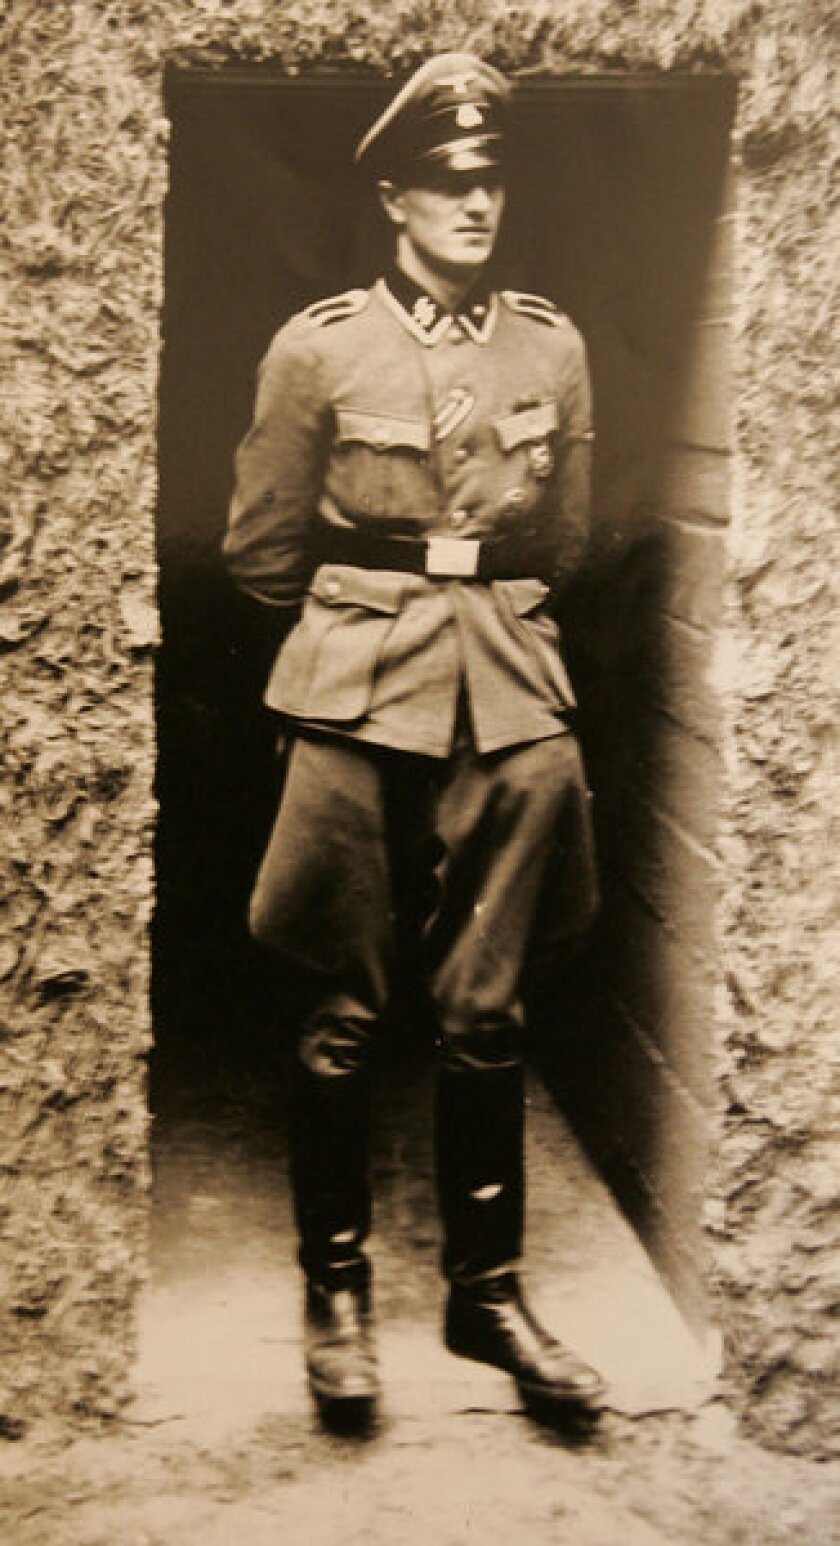 Hitler bodyguard Rochus Misch in 1944